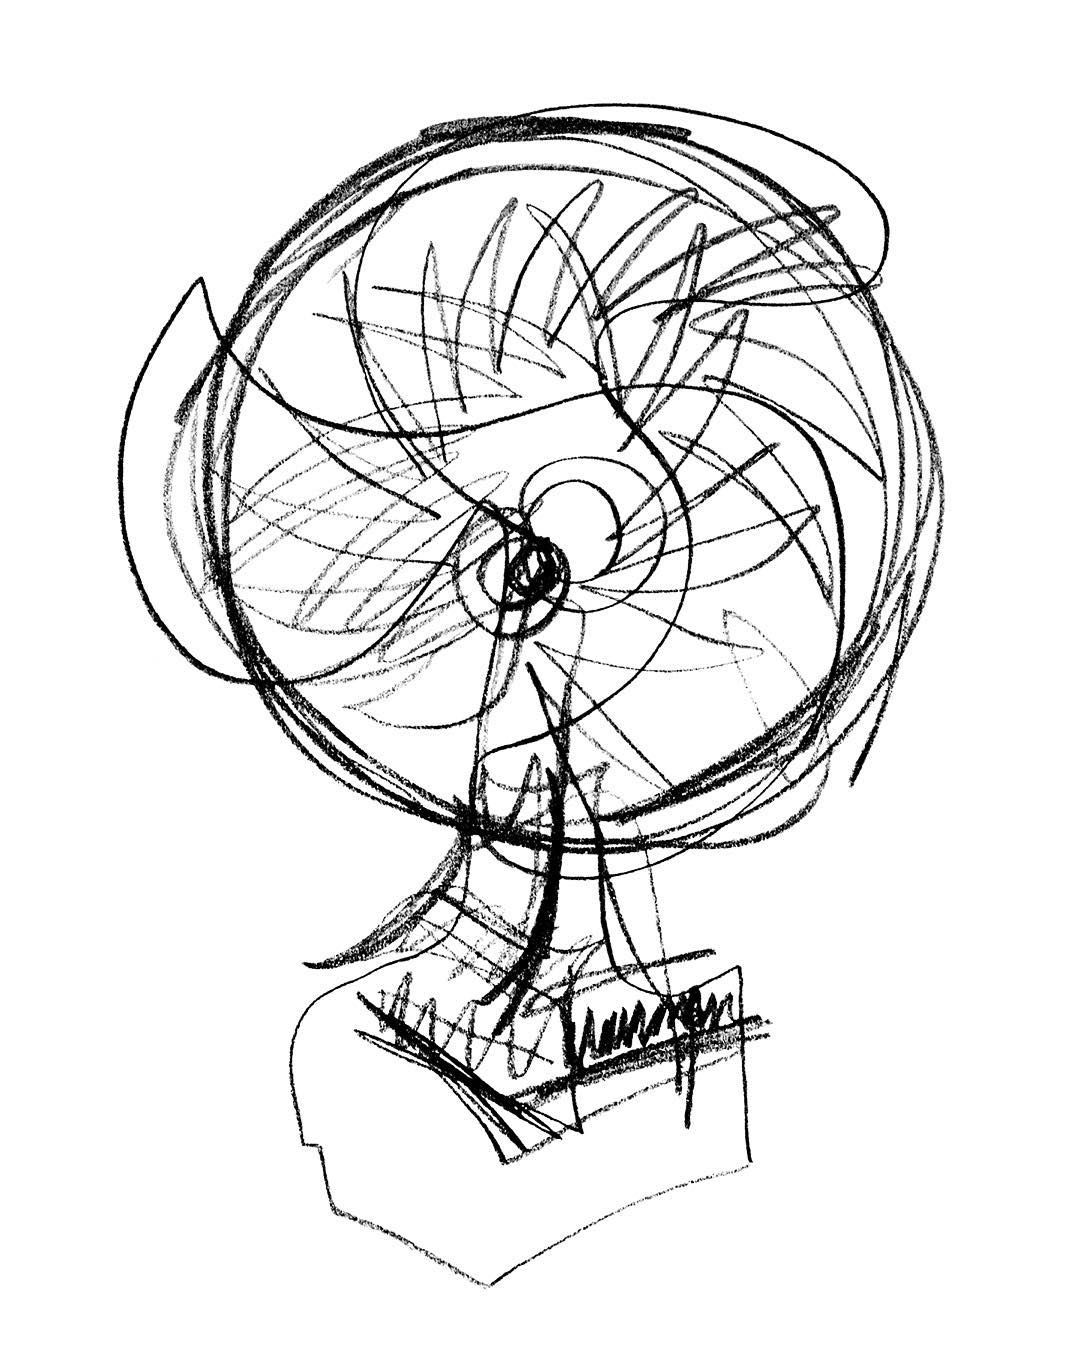 I love the freedom of #blindcontourdrawing - I should do one every morning. #blindcontour #conte #art #arte #dibujo #illustration #drawing #newmedium #drawingart #drawstagram #drawingclass #drawingskills #drawingoftheday #drawingsofinstagram #draw #sketch